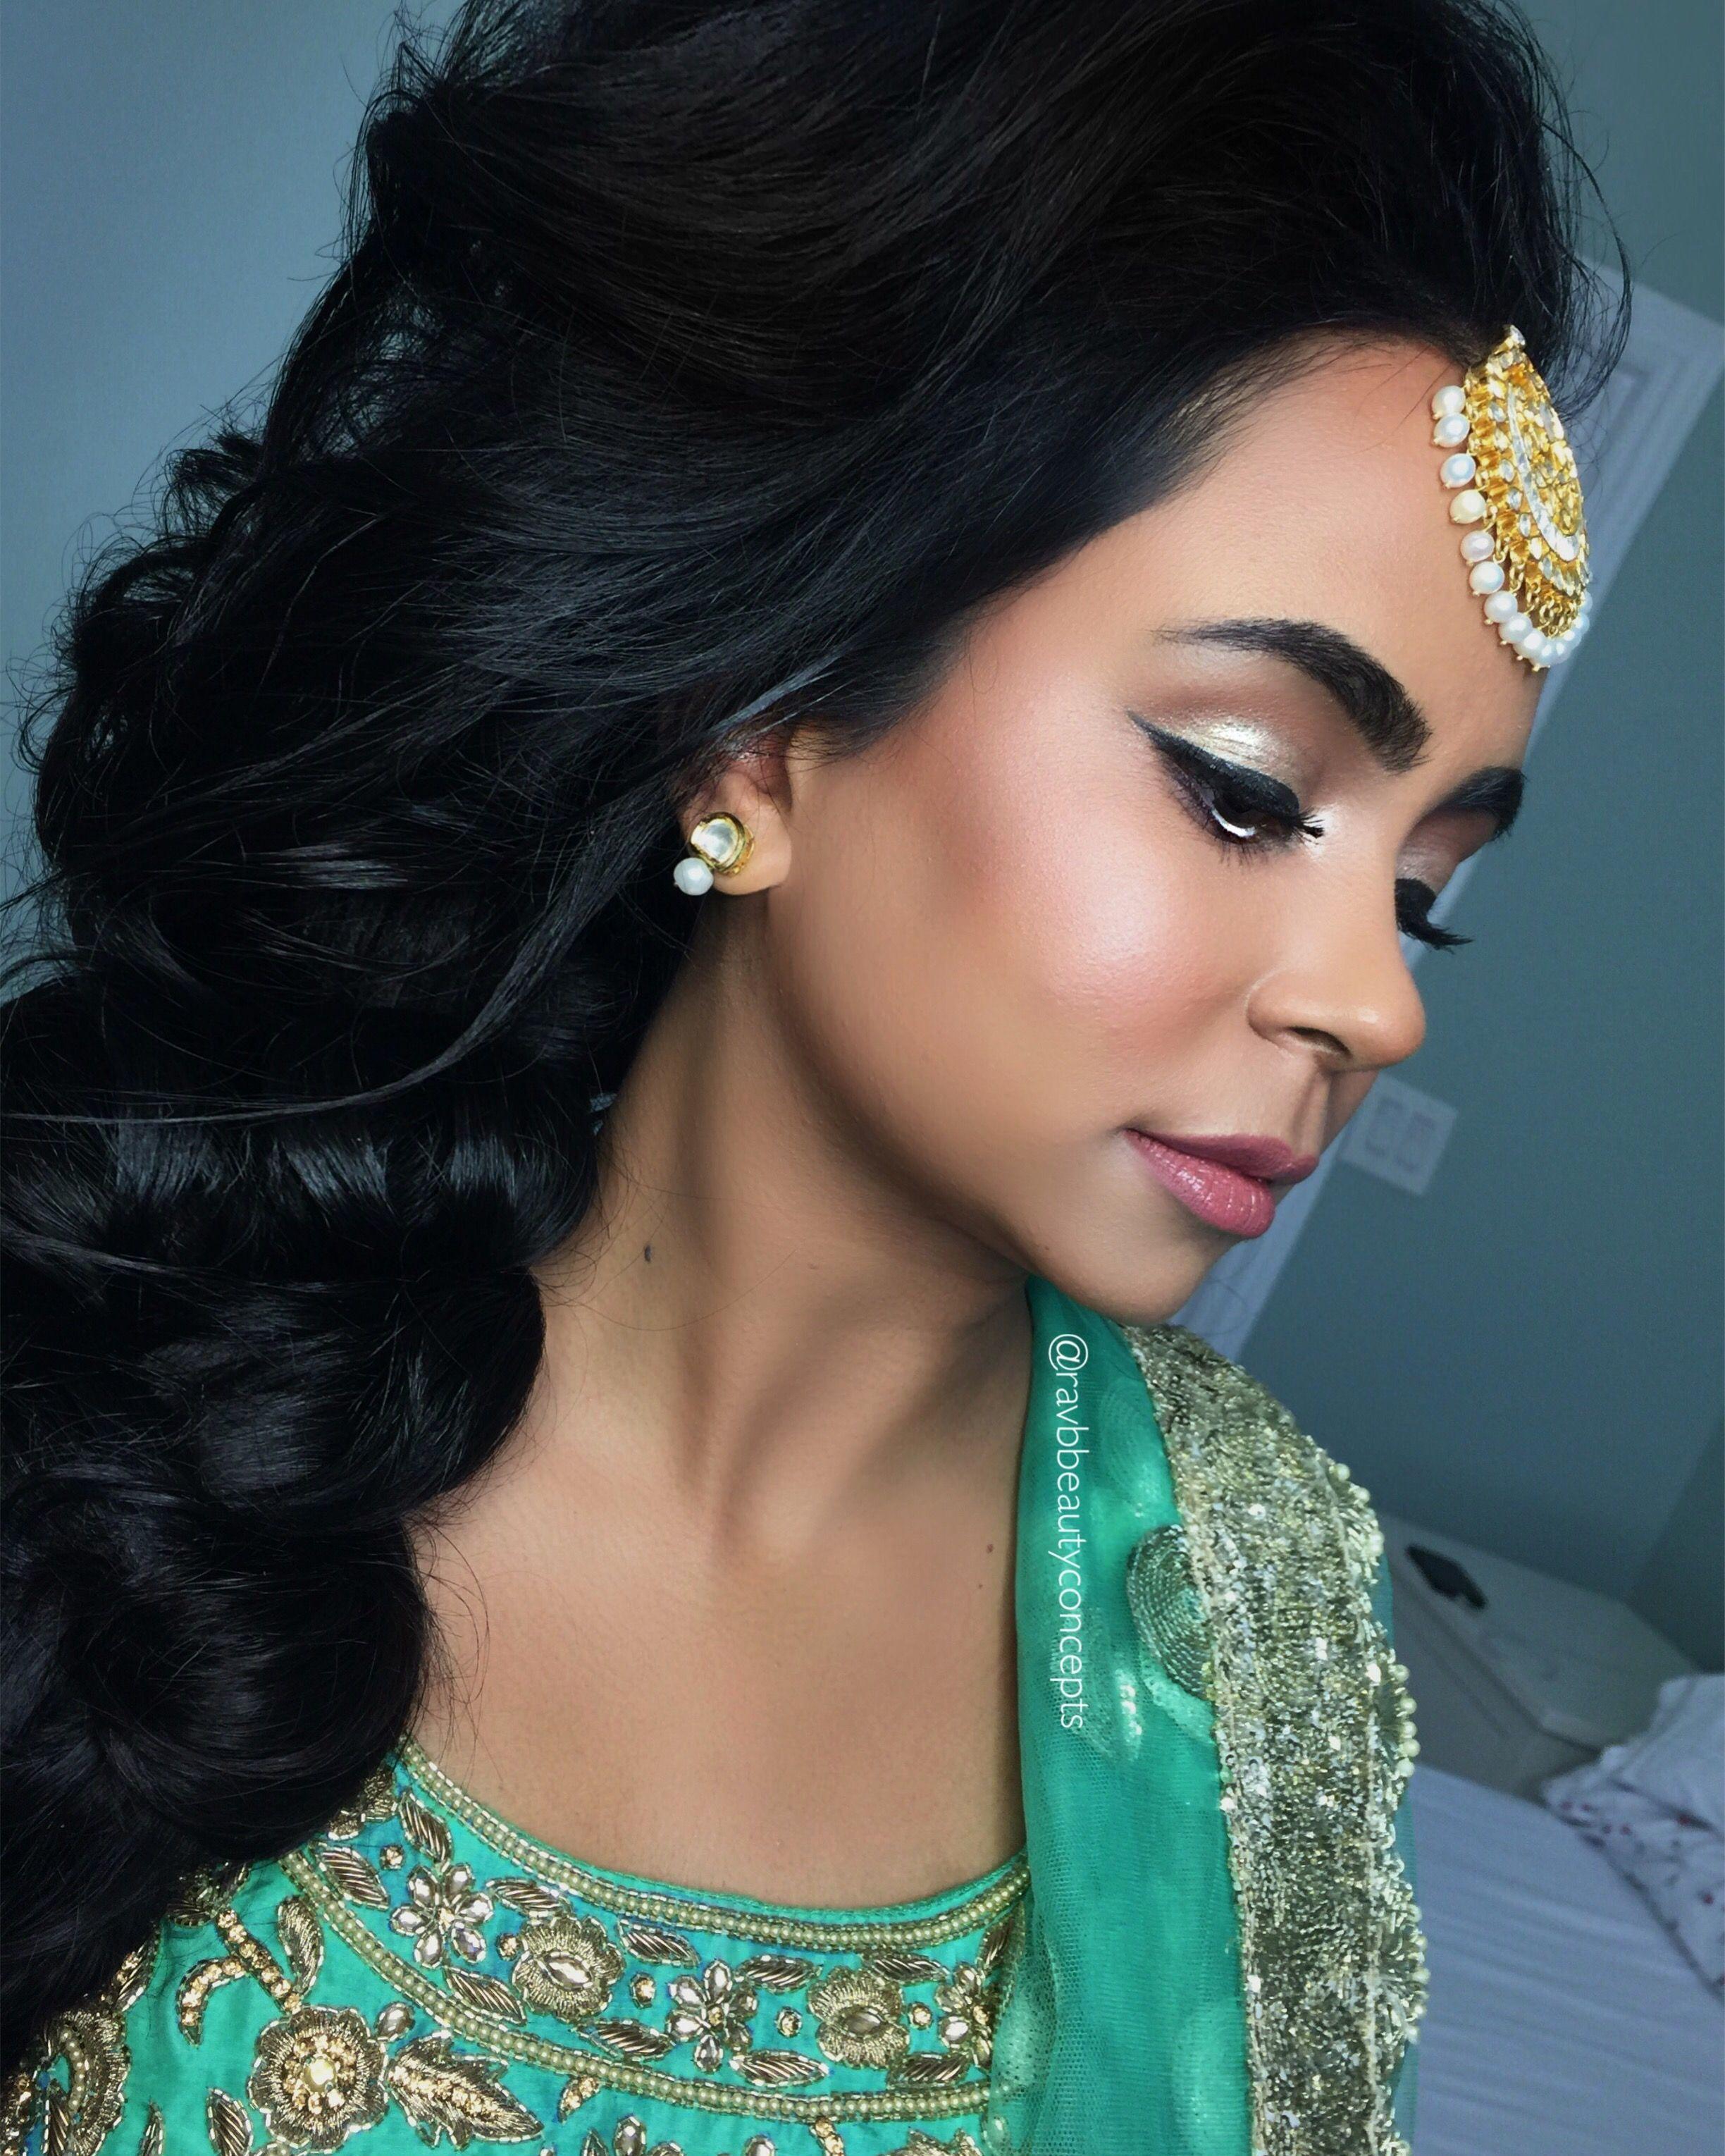 indian bridal makeup, indian bridal hair, bridal makeup, bridal